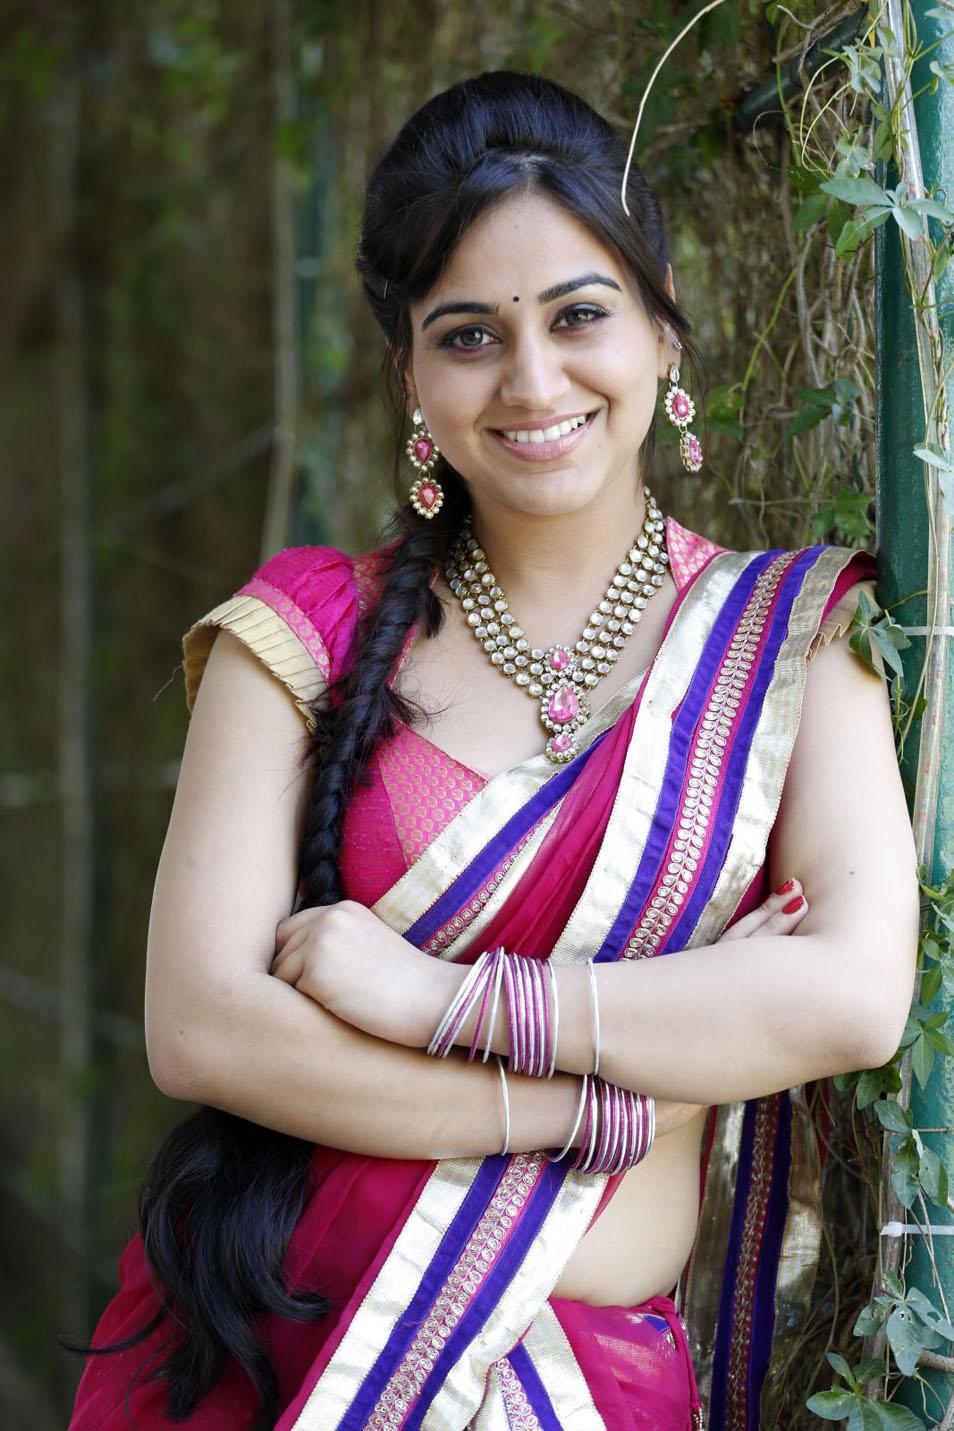 Cute aksha in pink saree